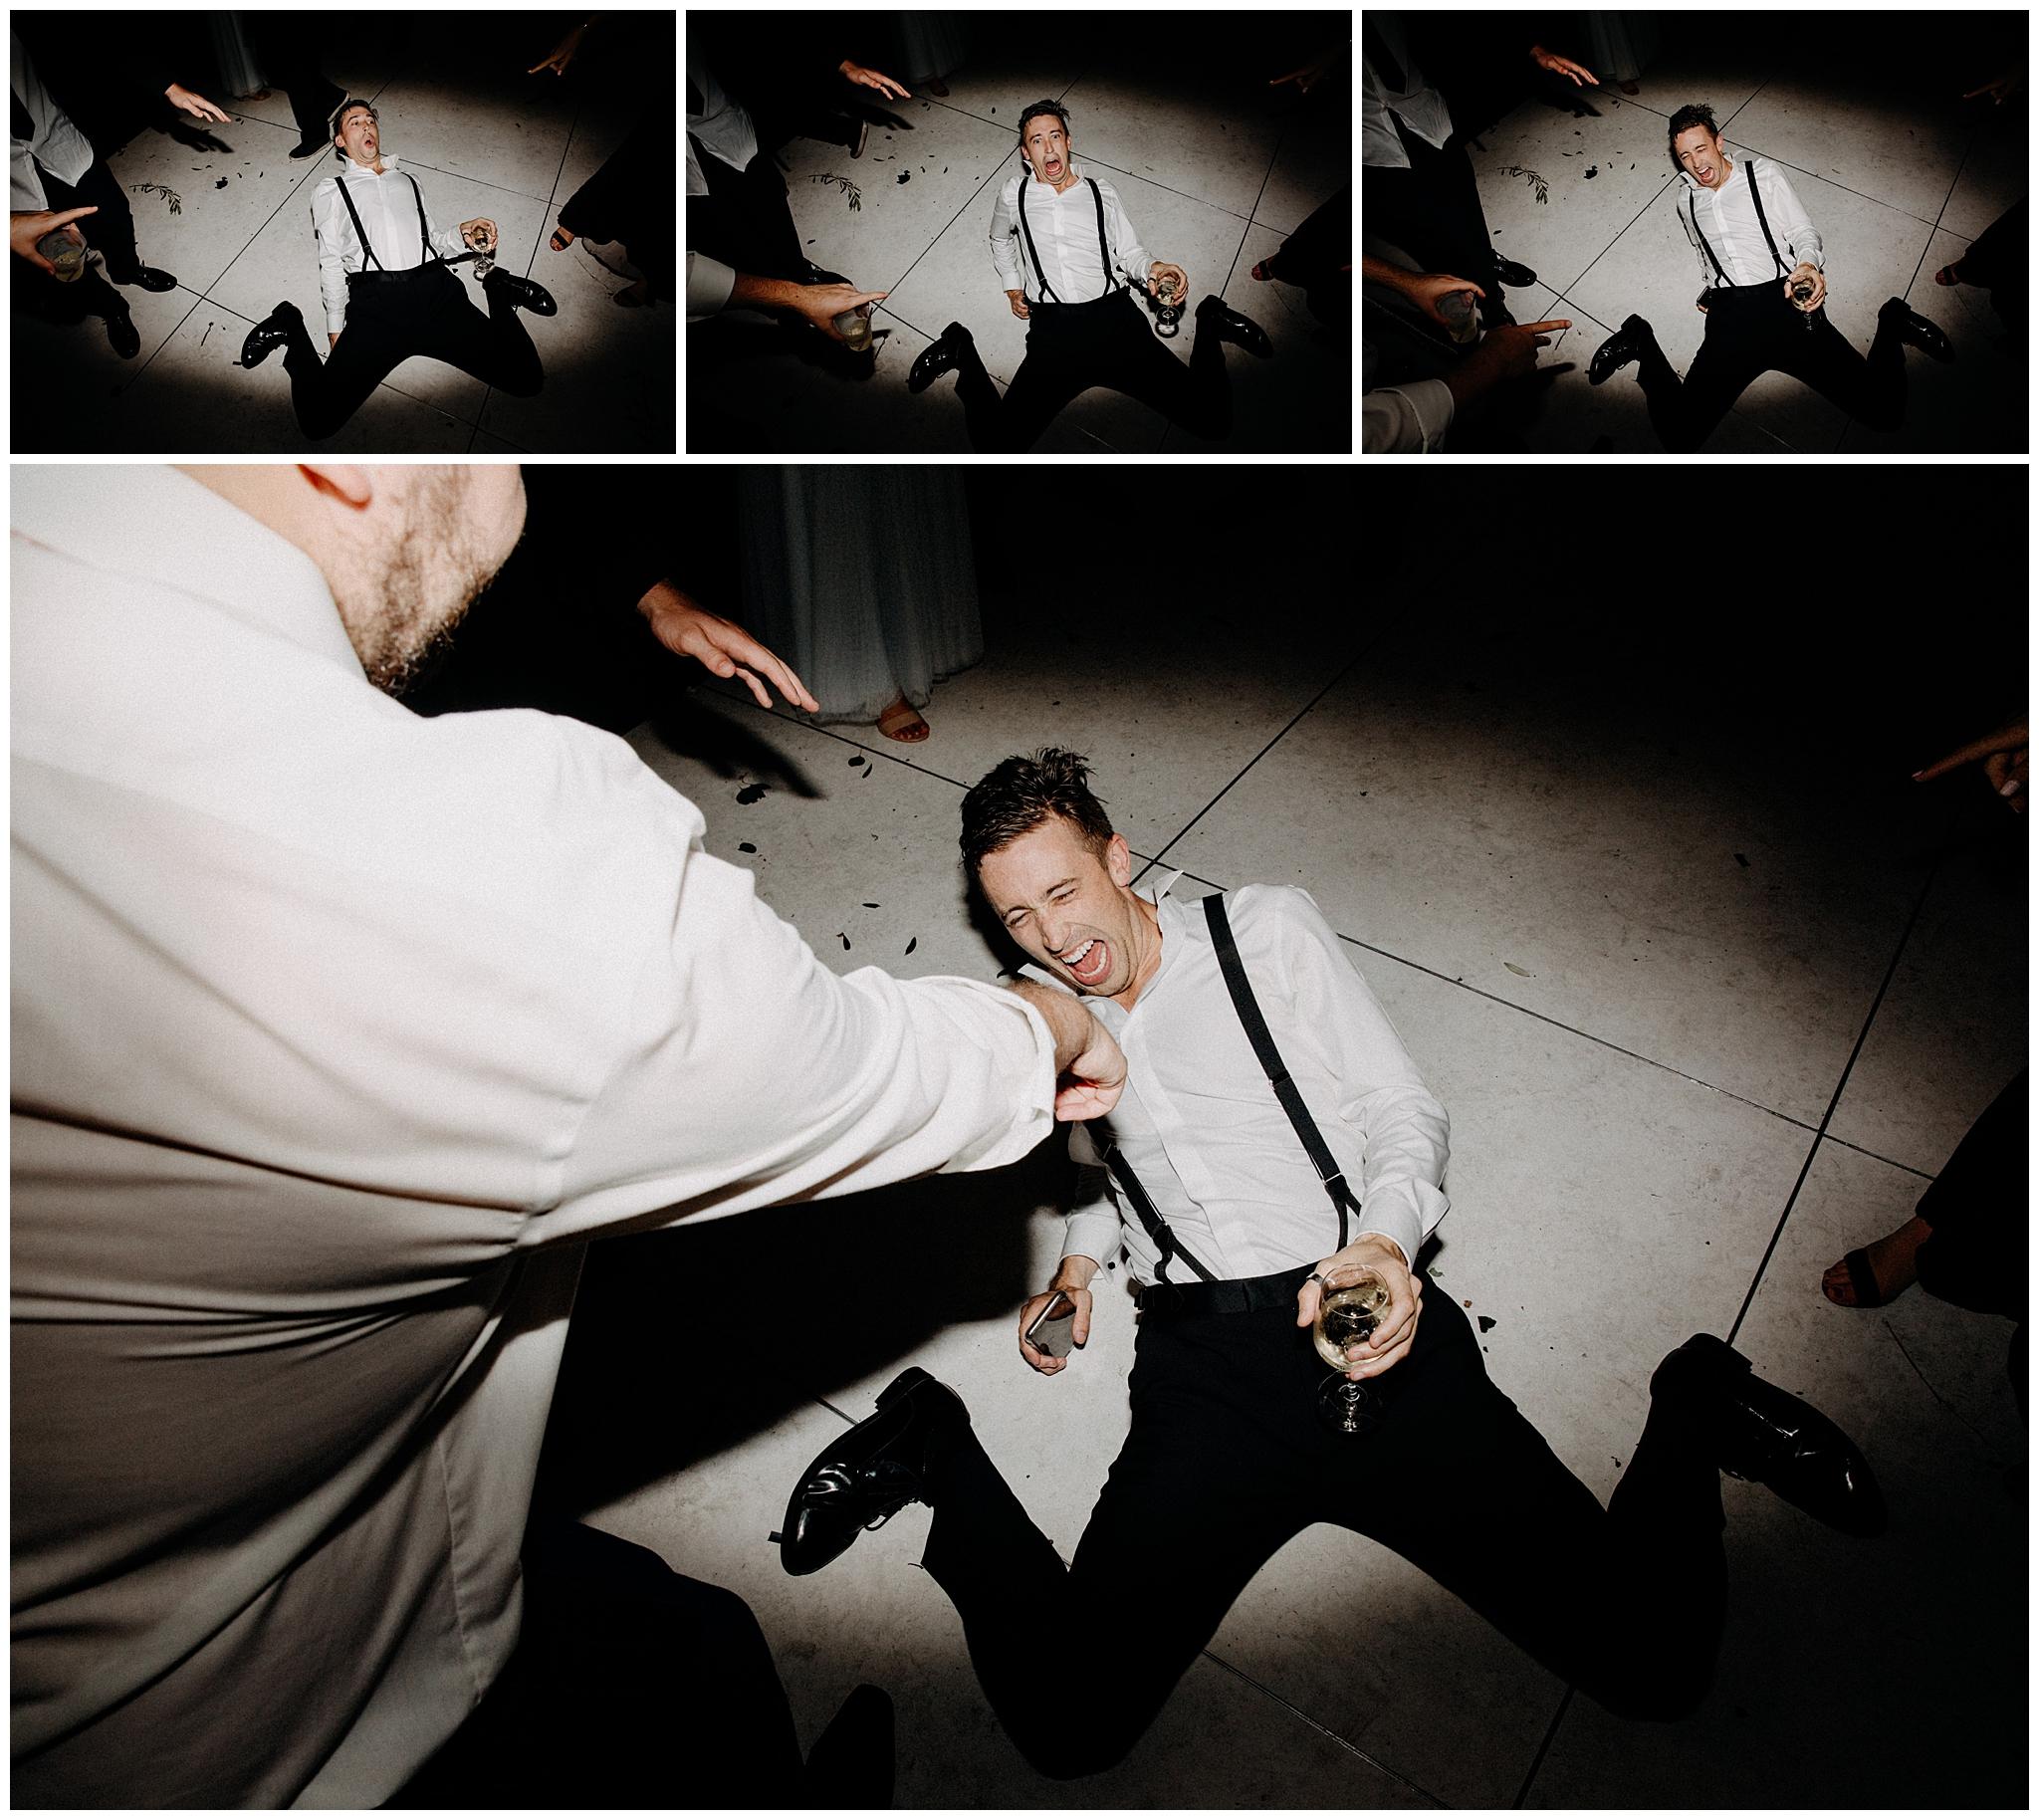 st-anthony-hotel-wedding-photography-10195san-antonio.JPG